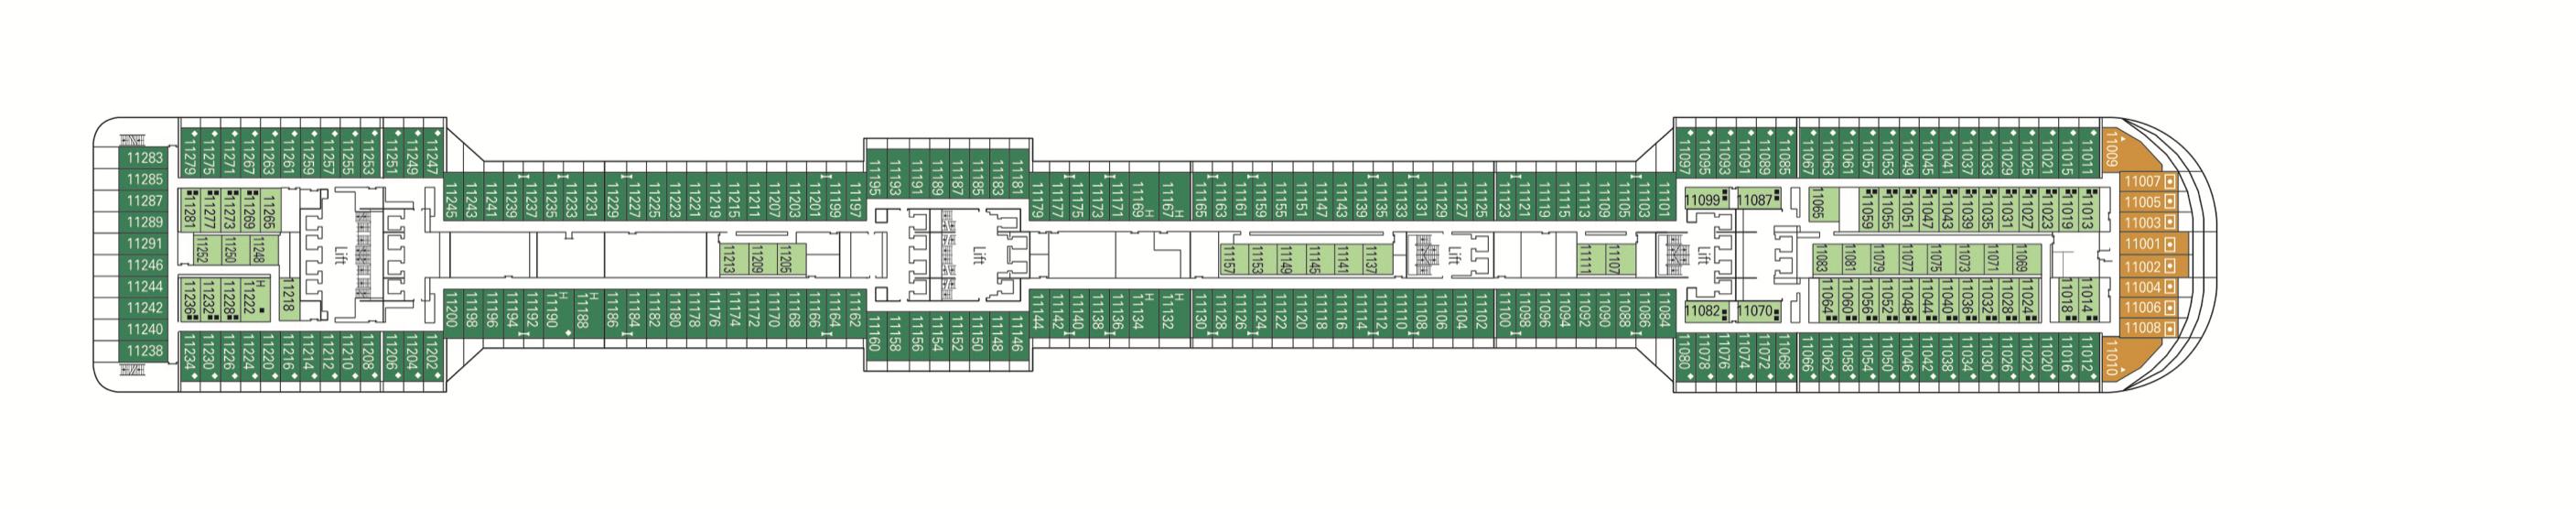 MSC Fantasia Class Splendida Deck 11.jpg